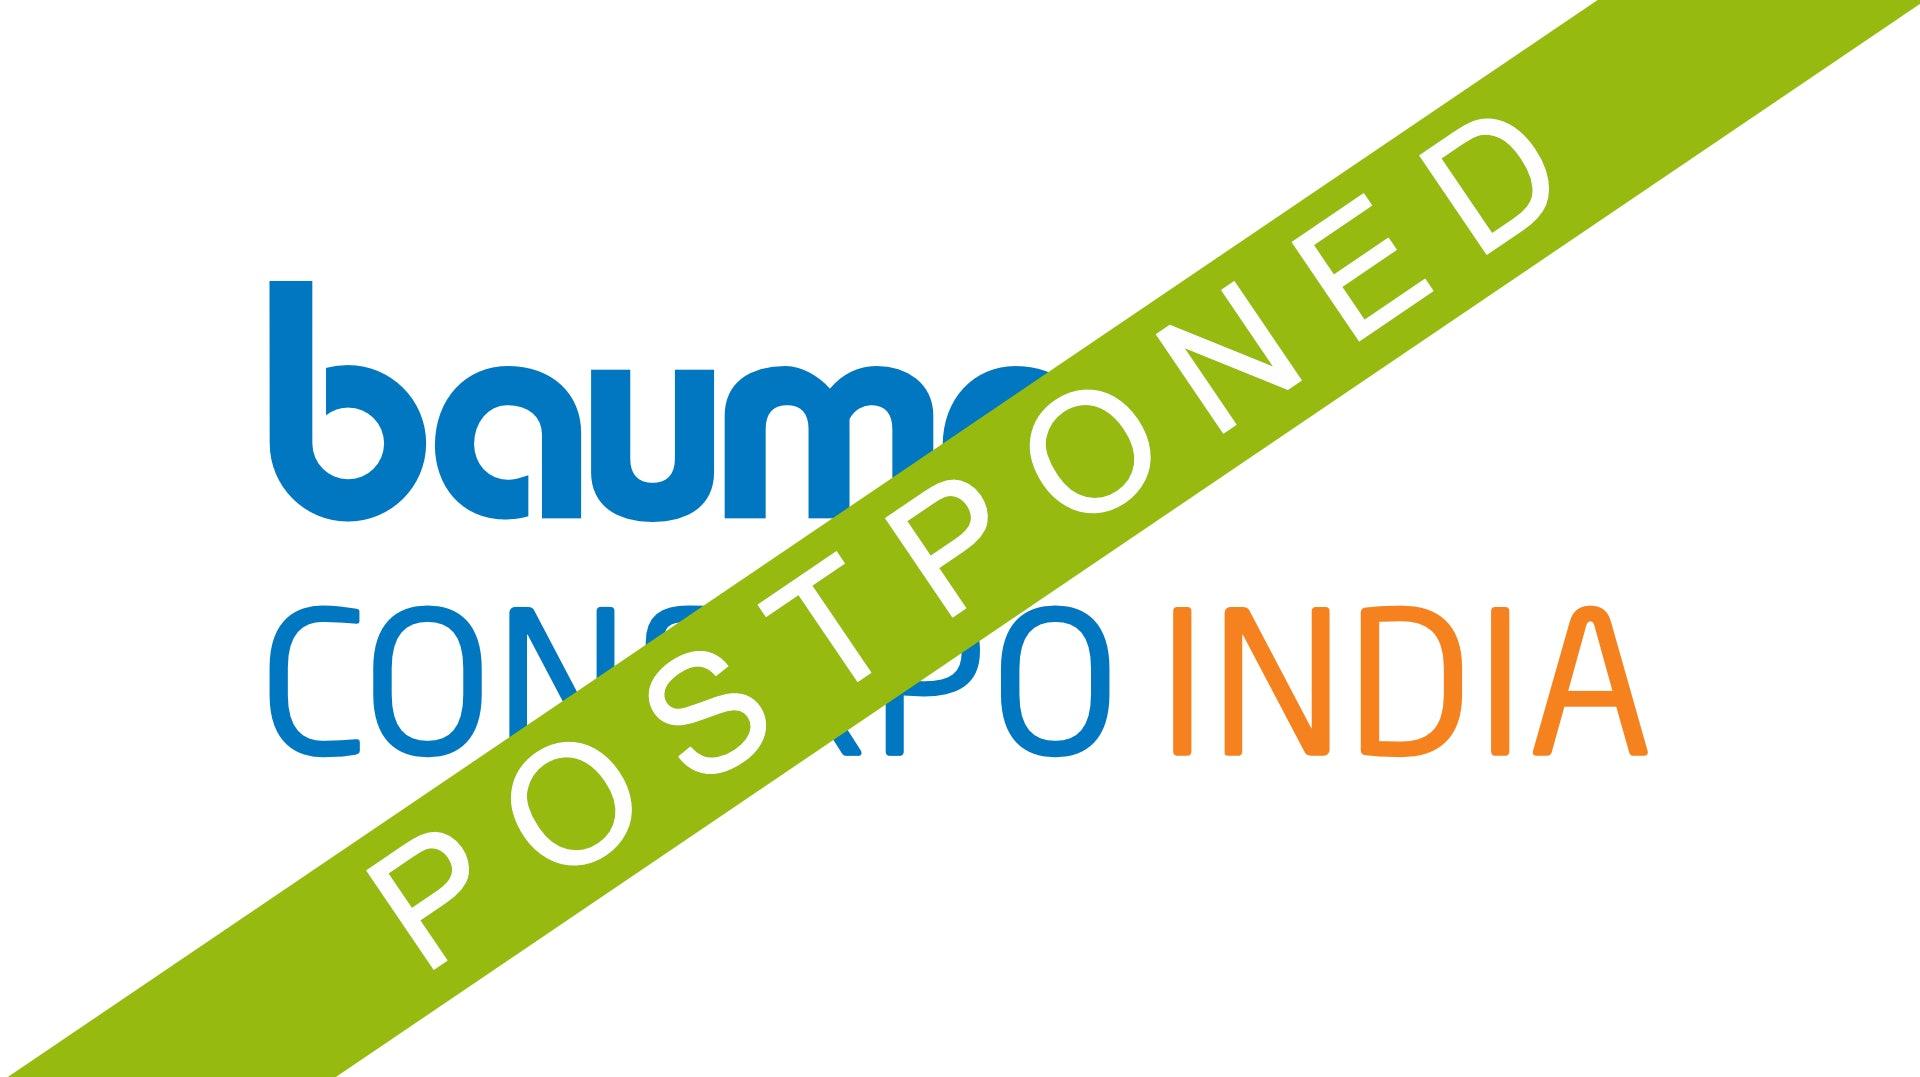 Bauma 2021 Conexpo India Postponed For Construction Pros